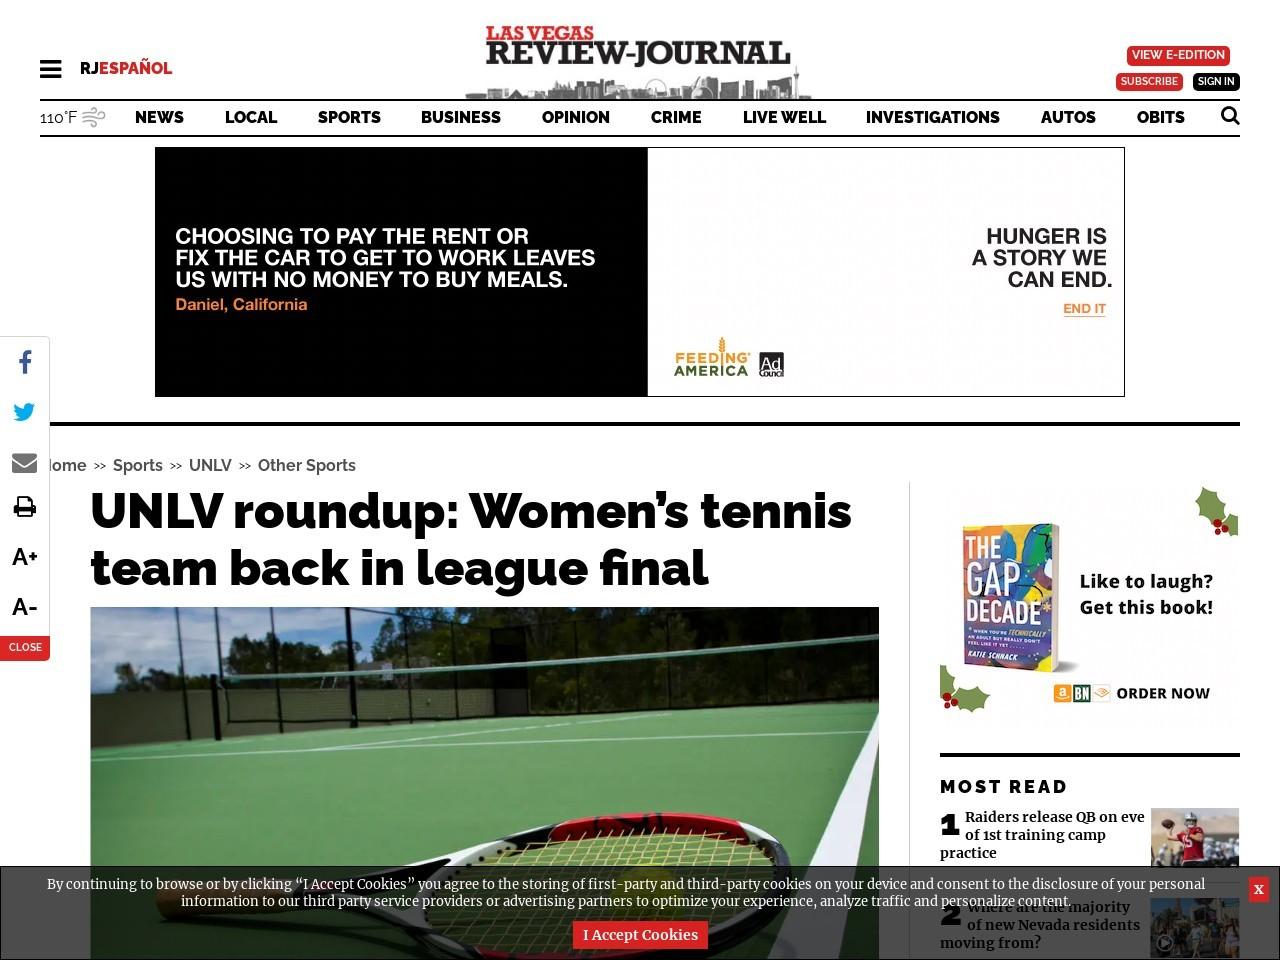 UNLV roundup: Women's tennis team back in league final